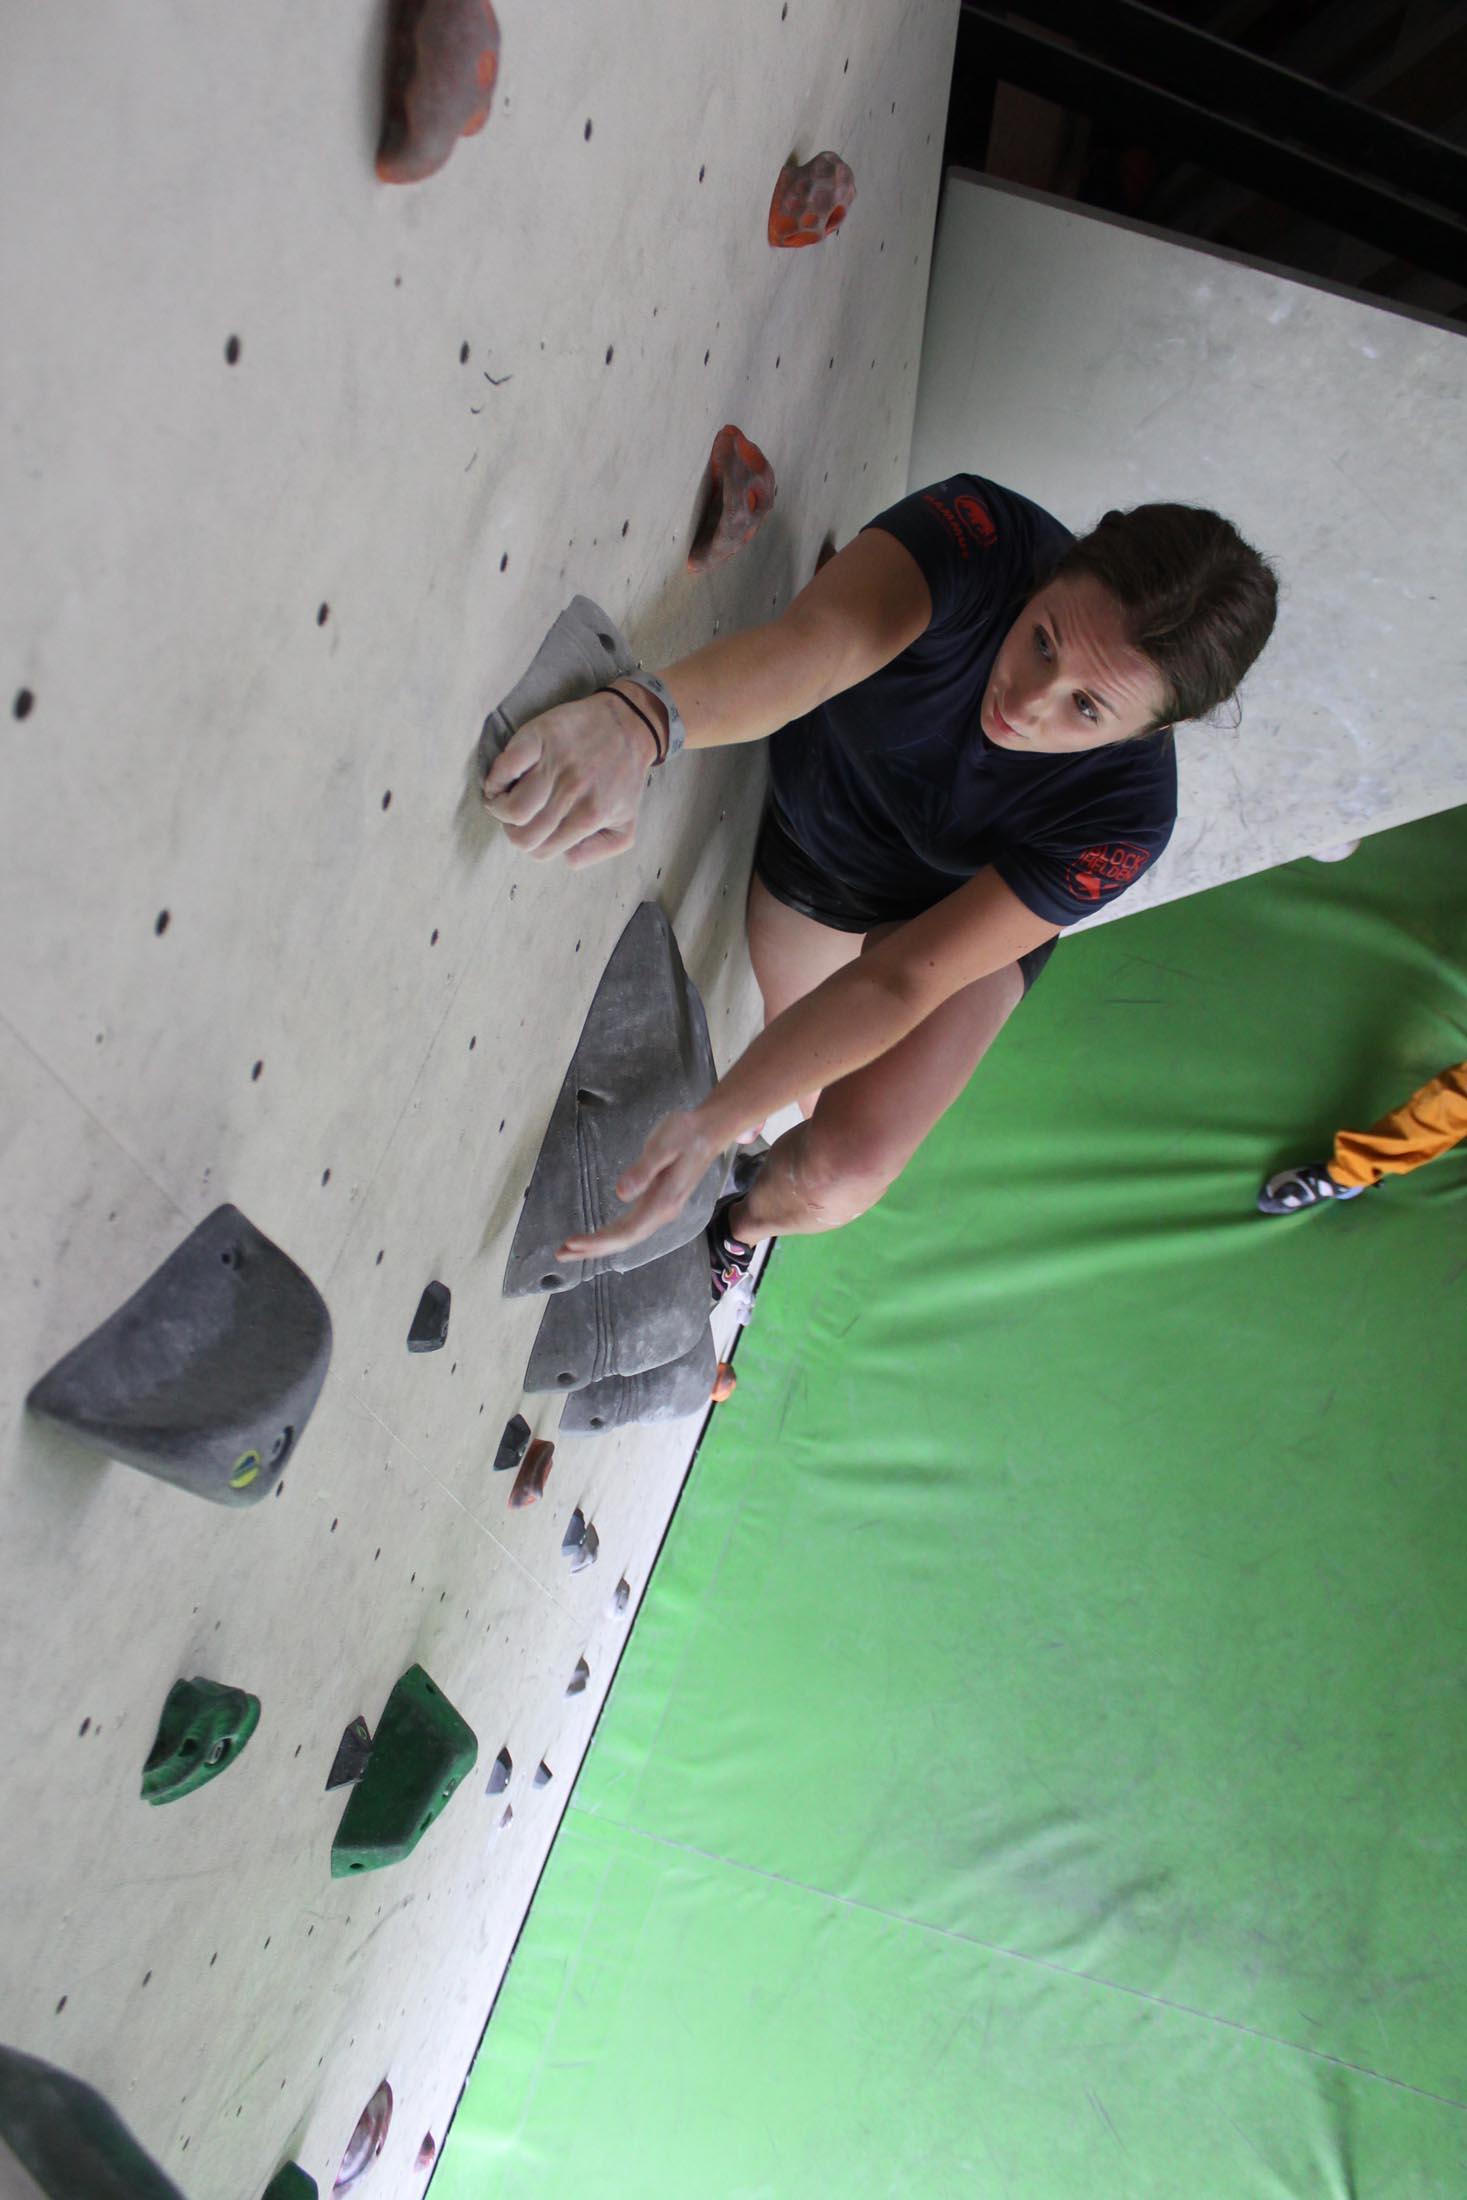 Quali, internationaler bouldercup Frankenjura 2016, BLOCKHELDEN Erlangen, Mammut, Bergfreunde.de, Boulderwettkampf07092016145